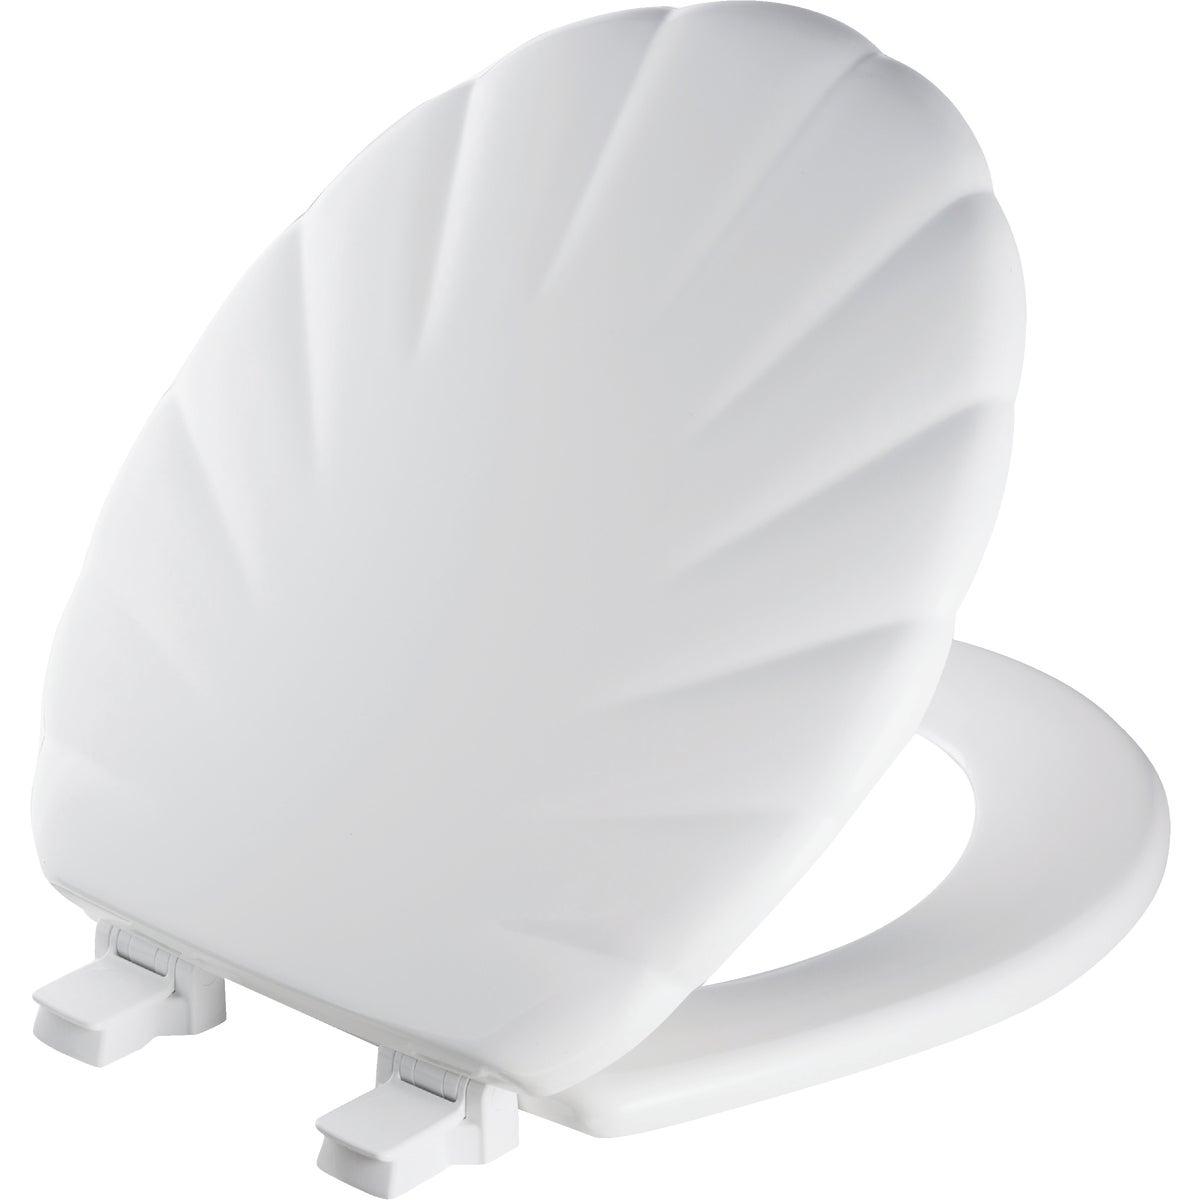 Bemis Designer Sculptured Round Shell Wood Toilet Seat at Sears.com